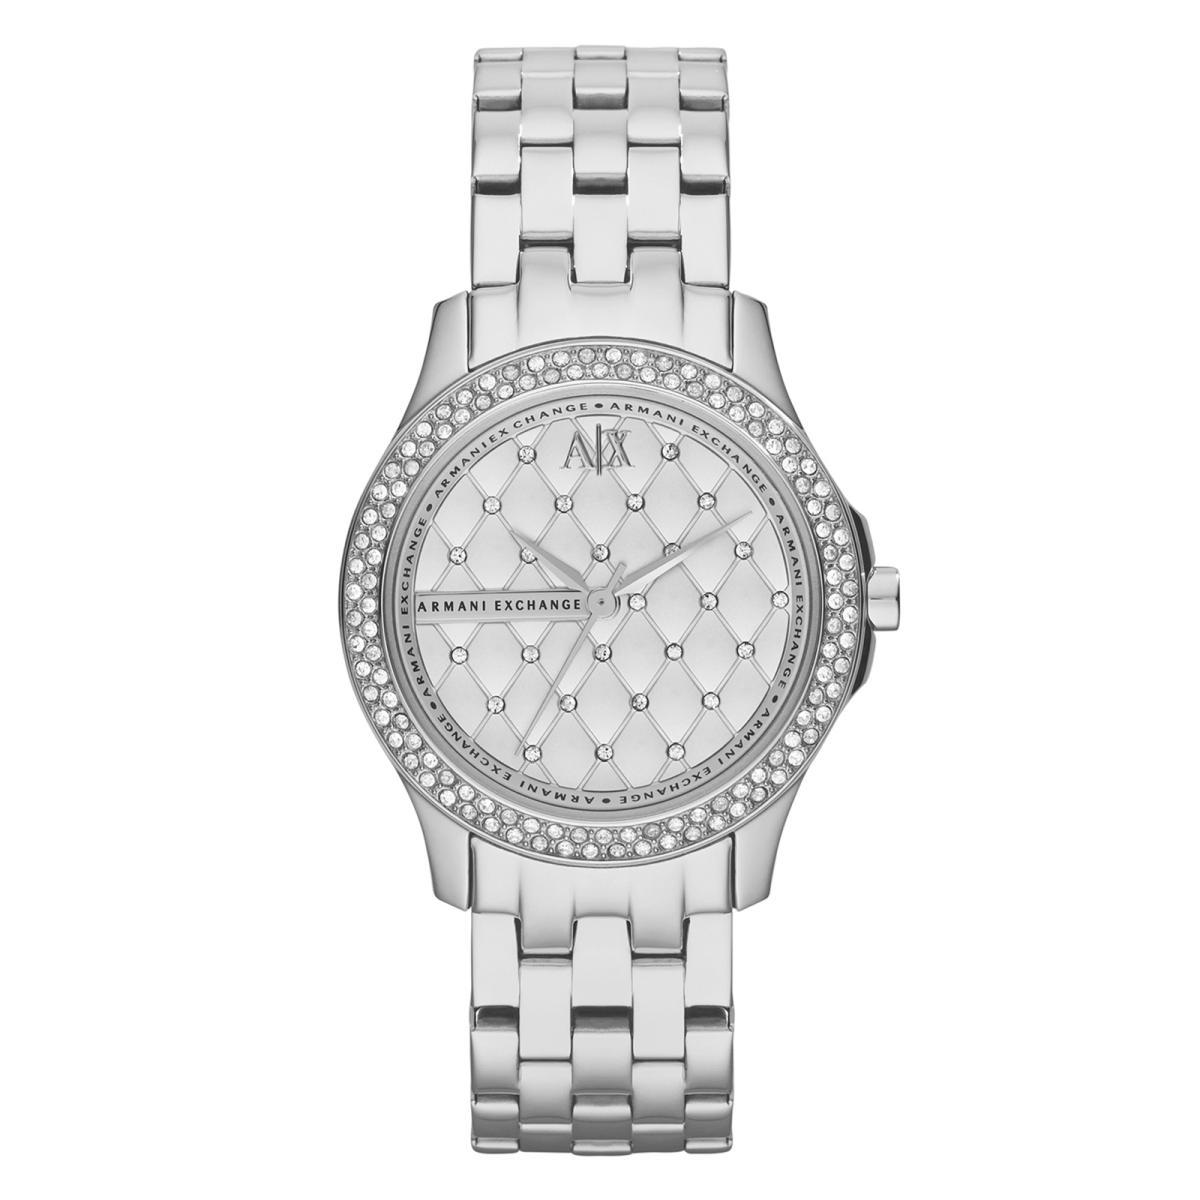 41f1c5d26ba5 Reloj Armani Exchange - AX5215 - Mujer - Time Square